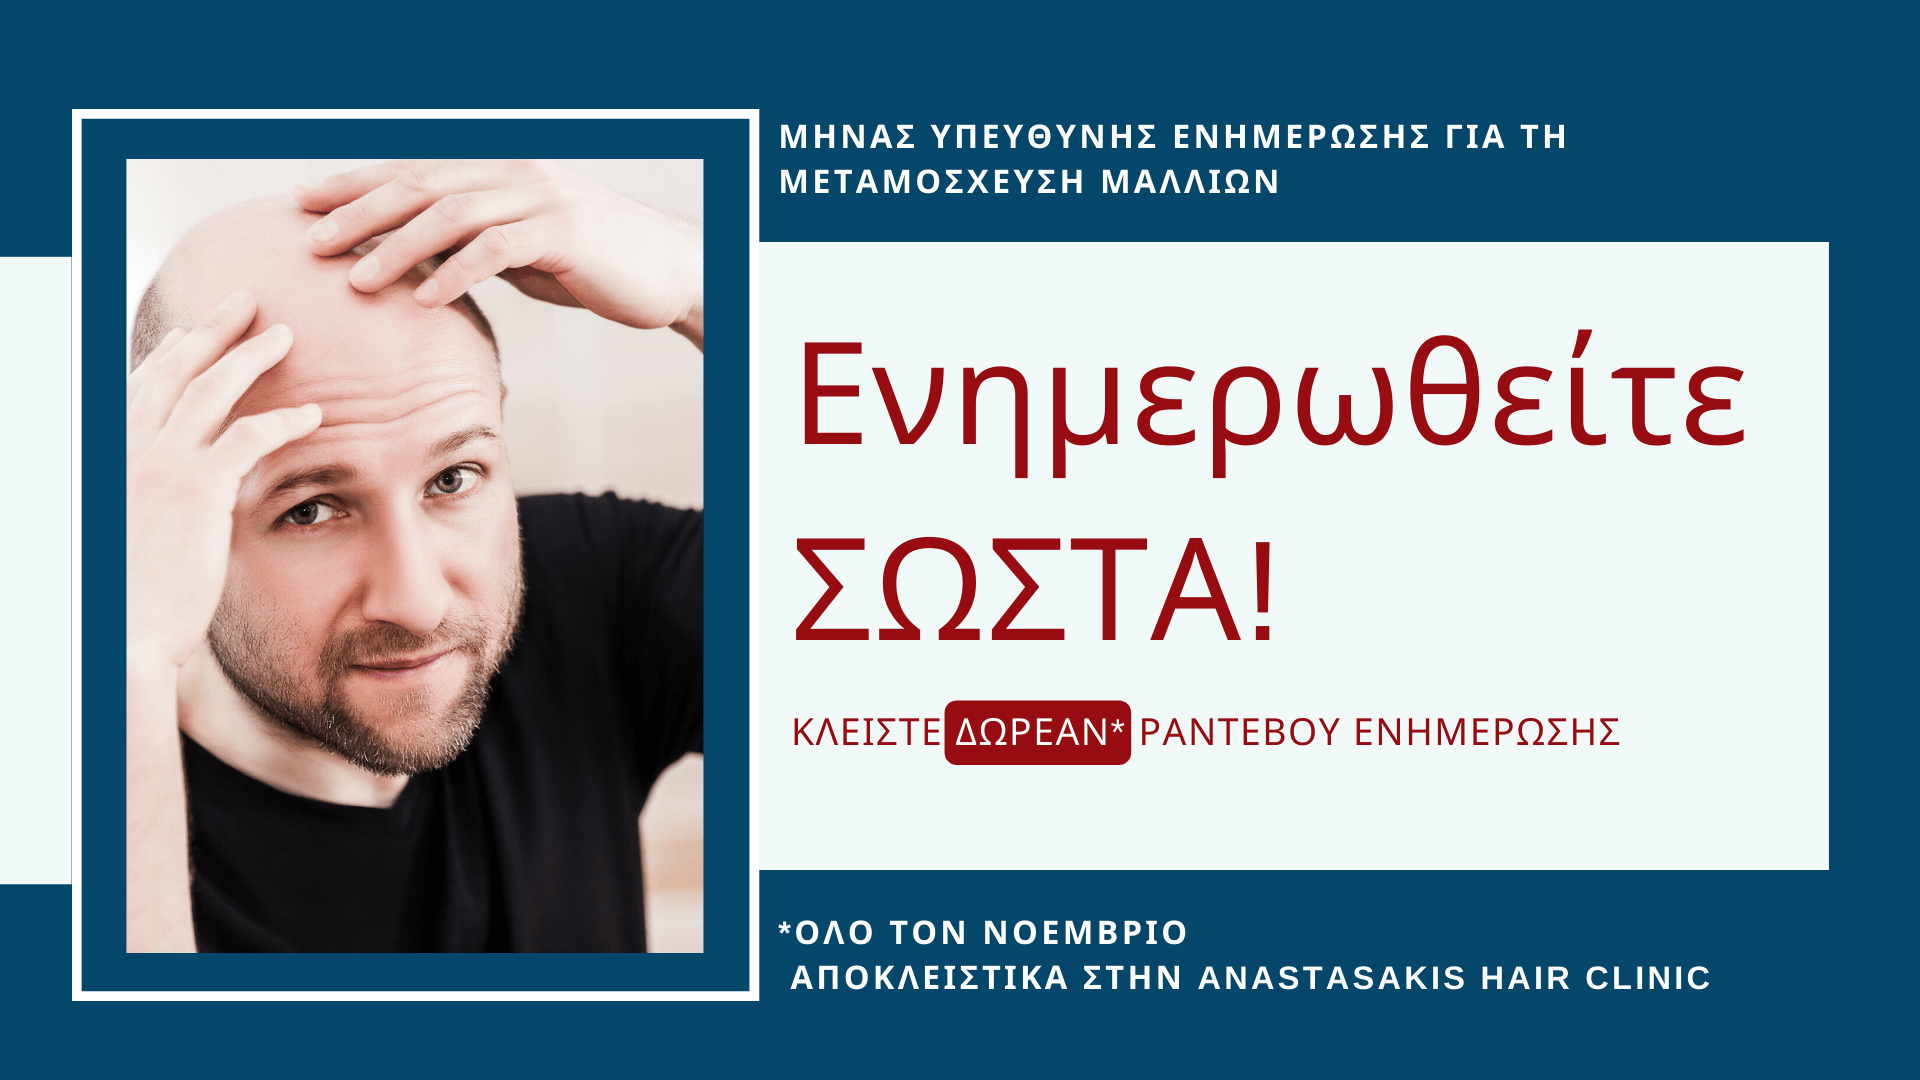 Anastasakis Hair Clinic δωρεάν ραντεβου για μεταμοσχευση μαλλιών.